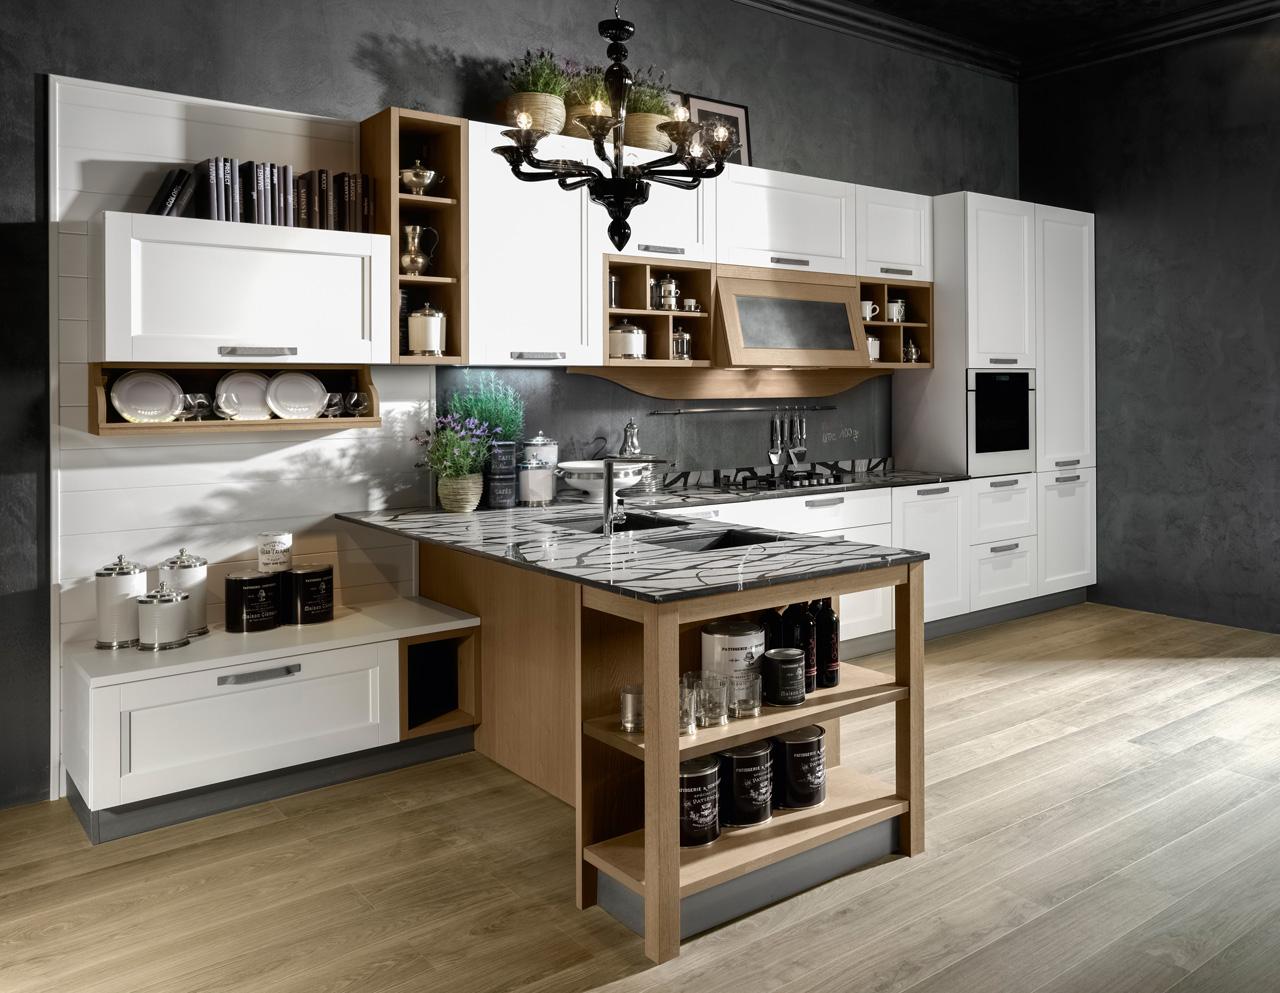 Cucine dal gusto classico-contemporaneo | Ambiente Cucina